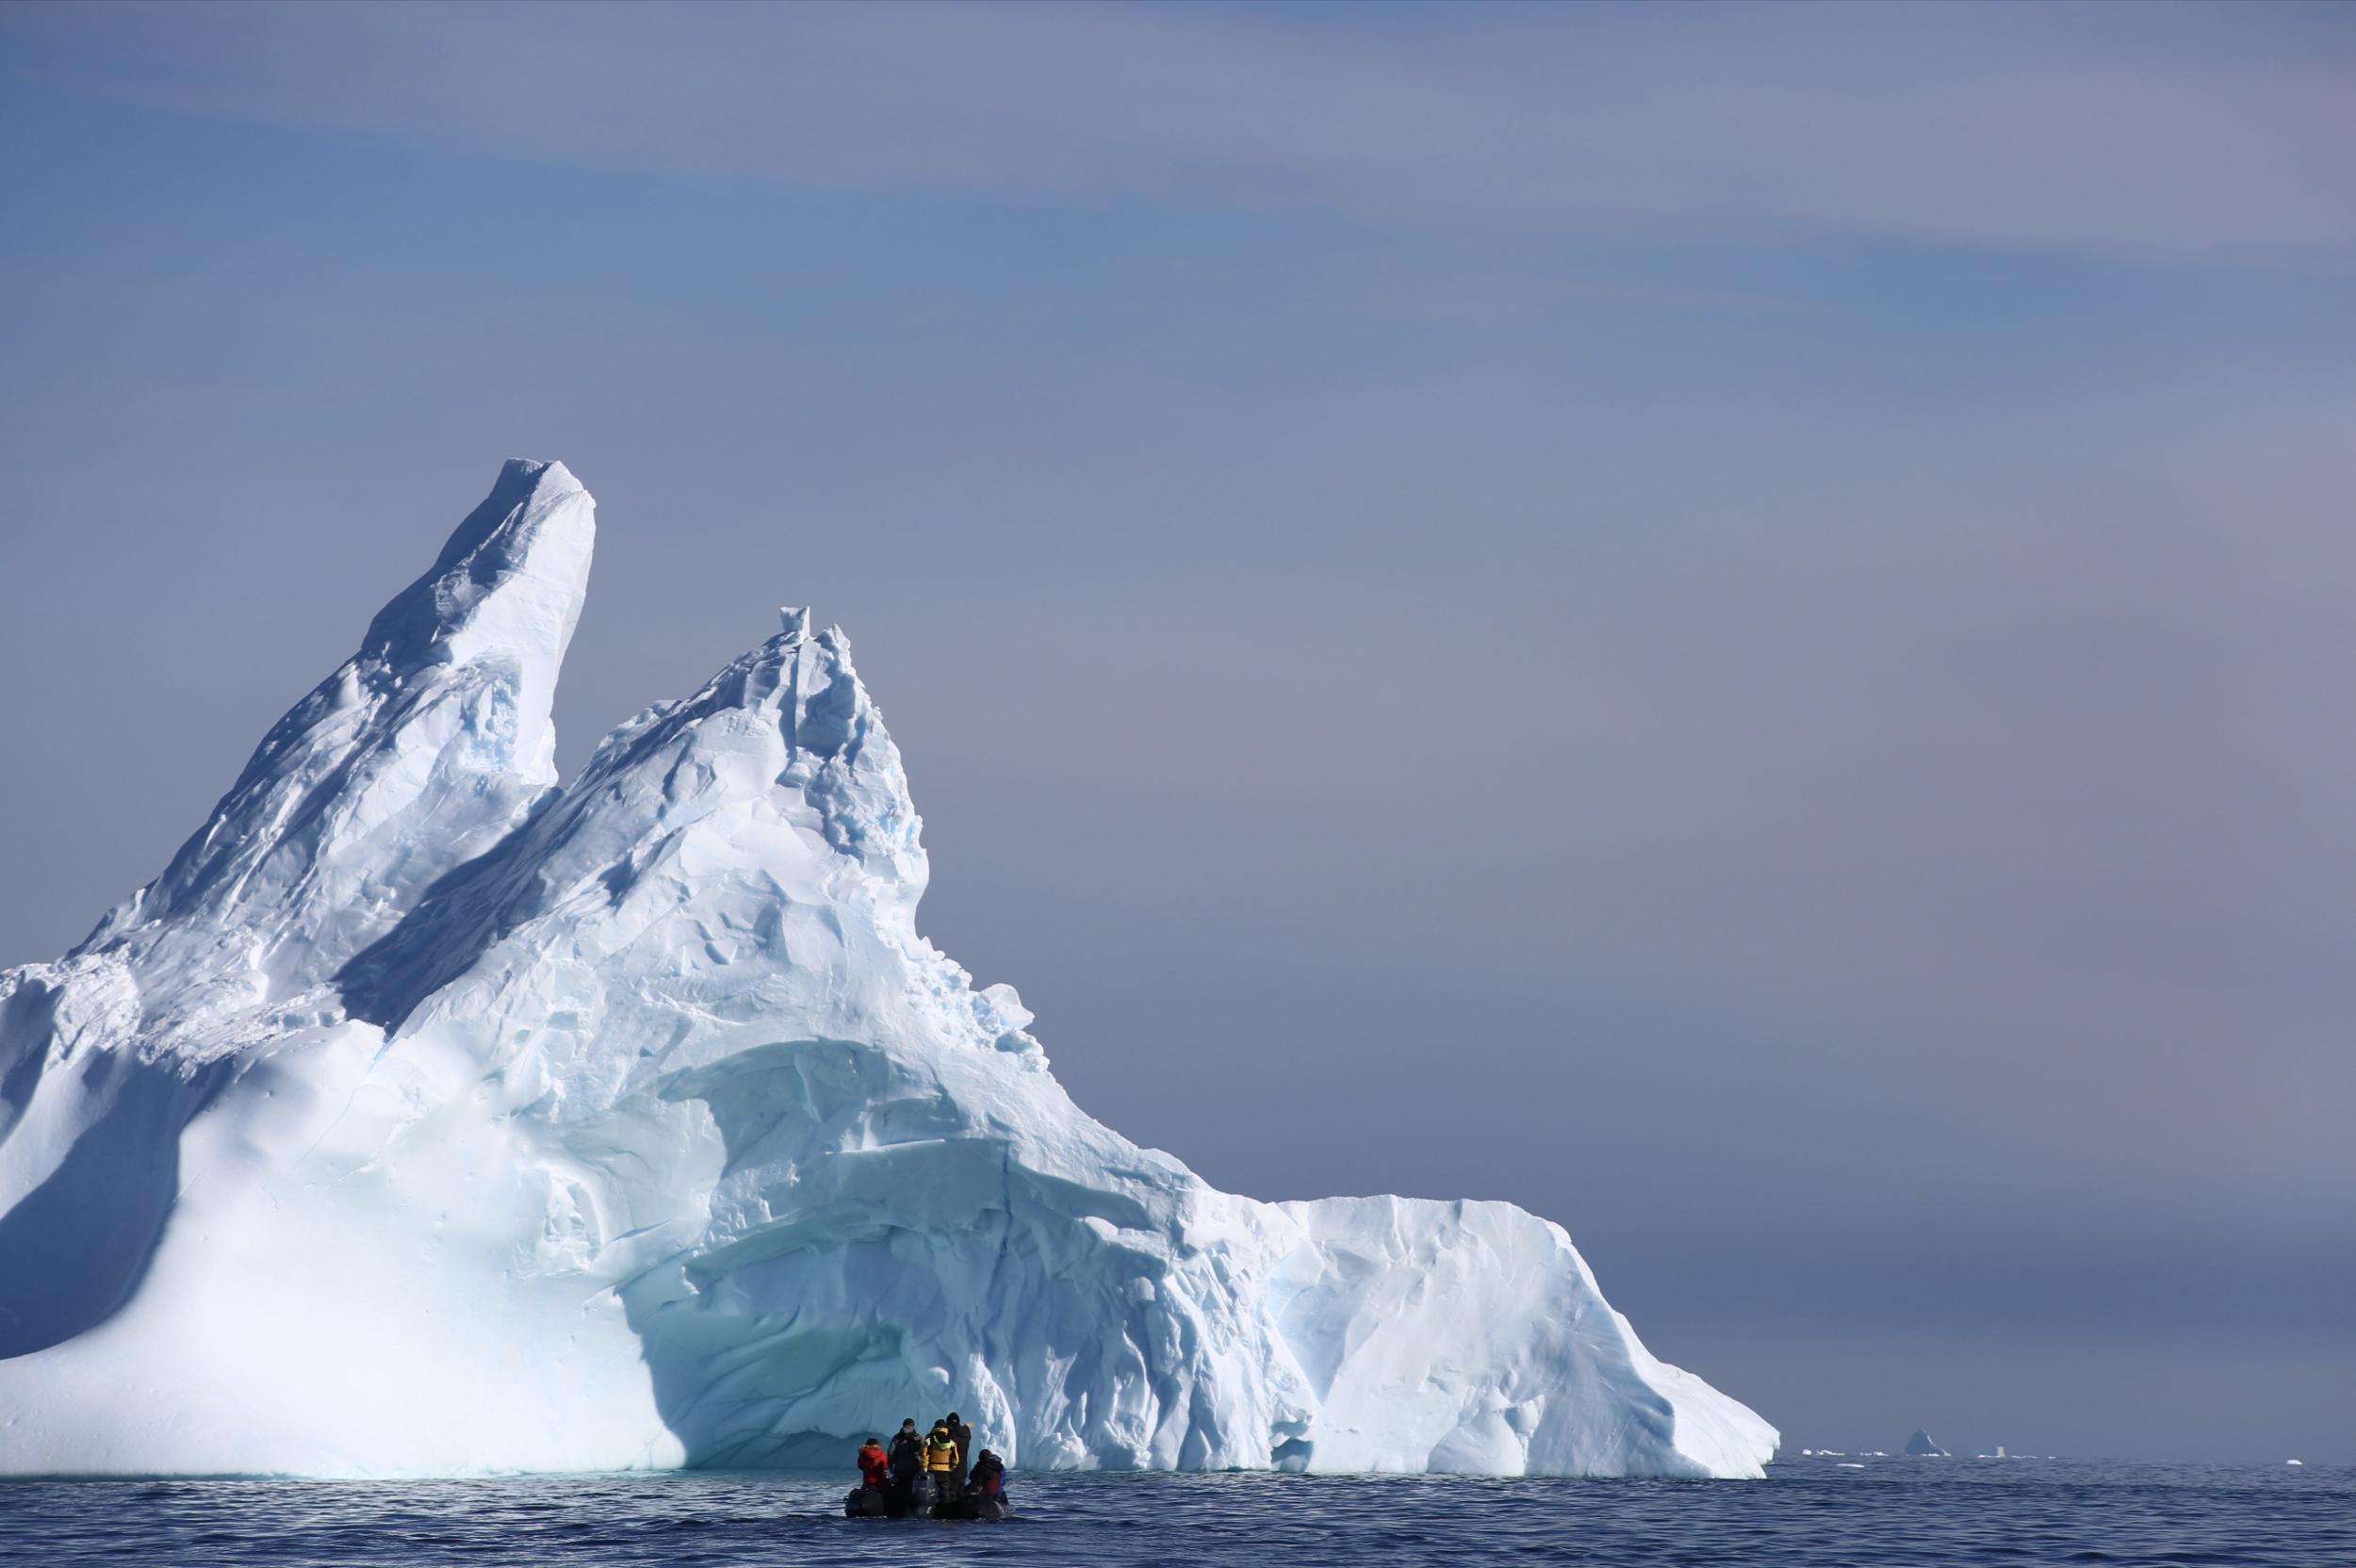 for Antarctica 21